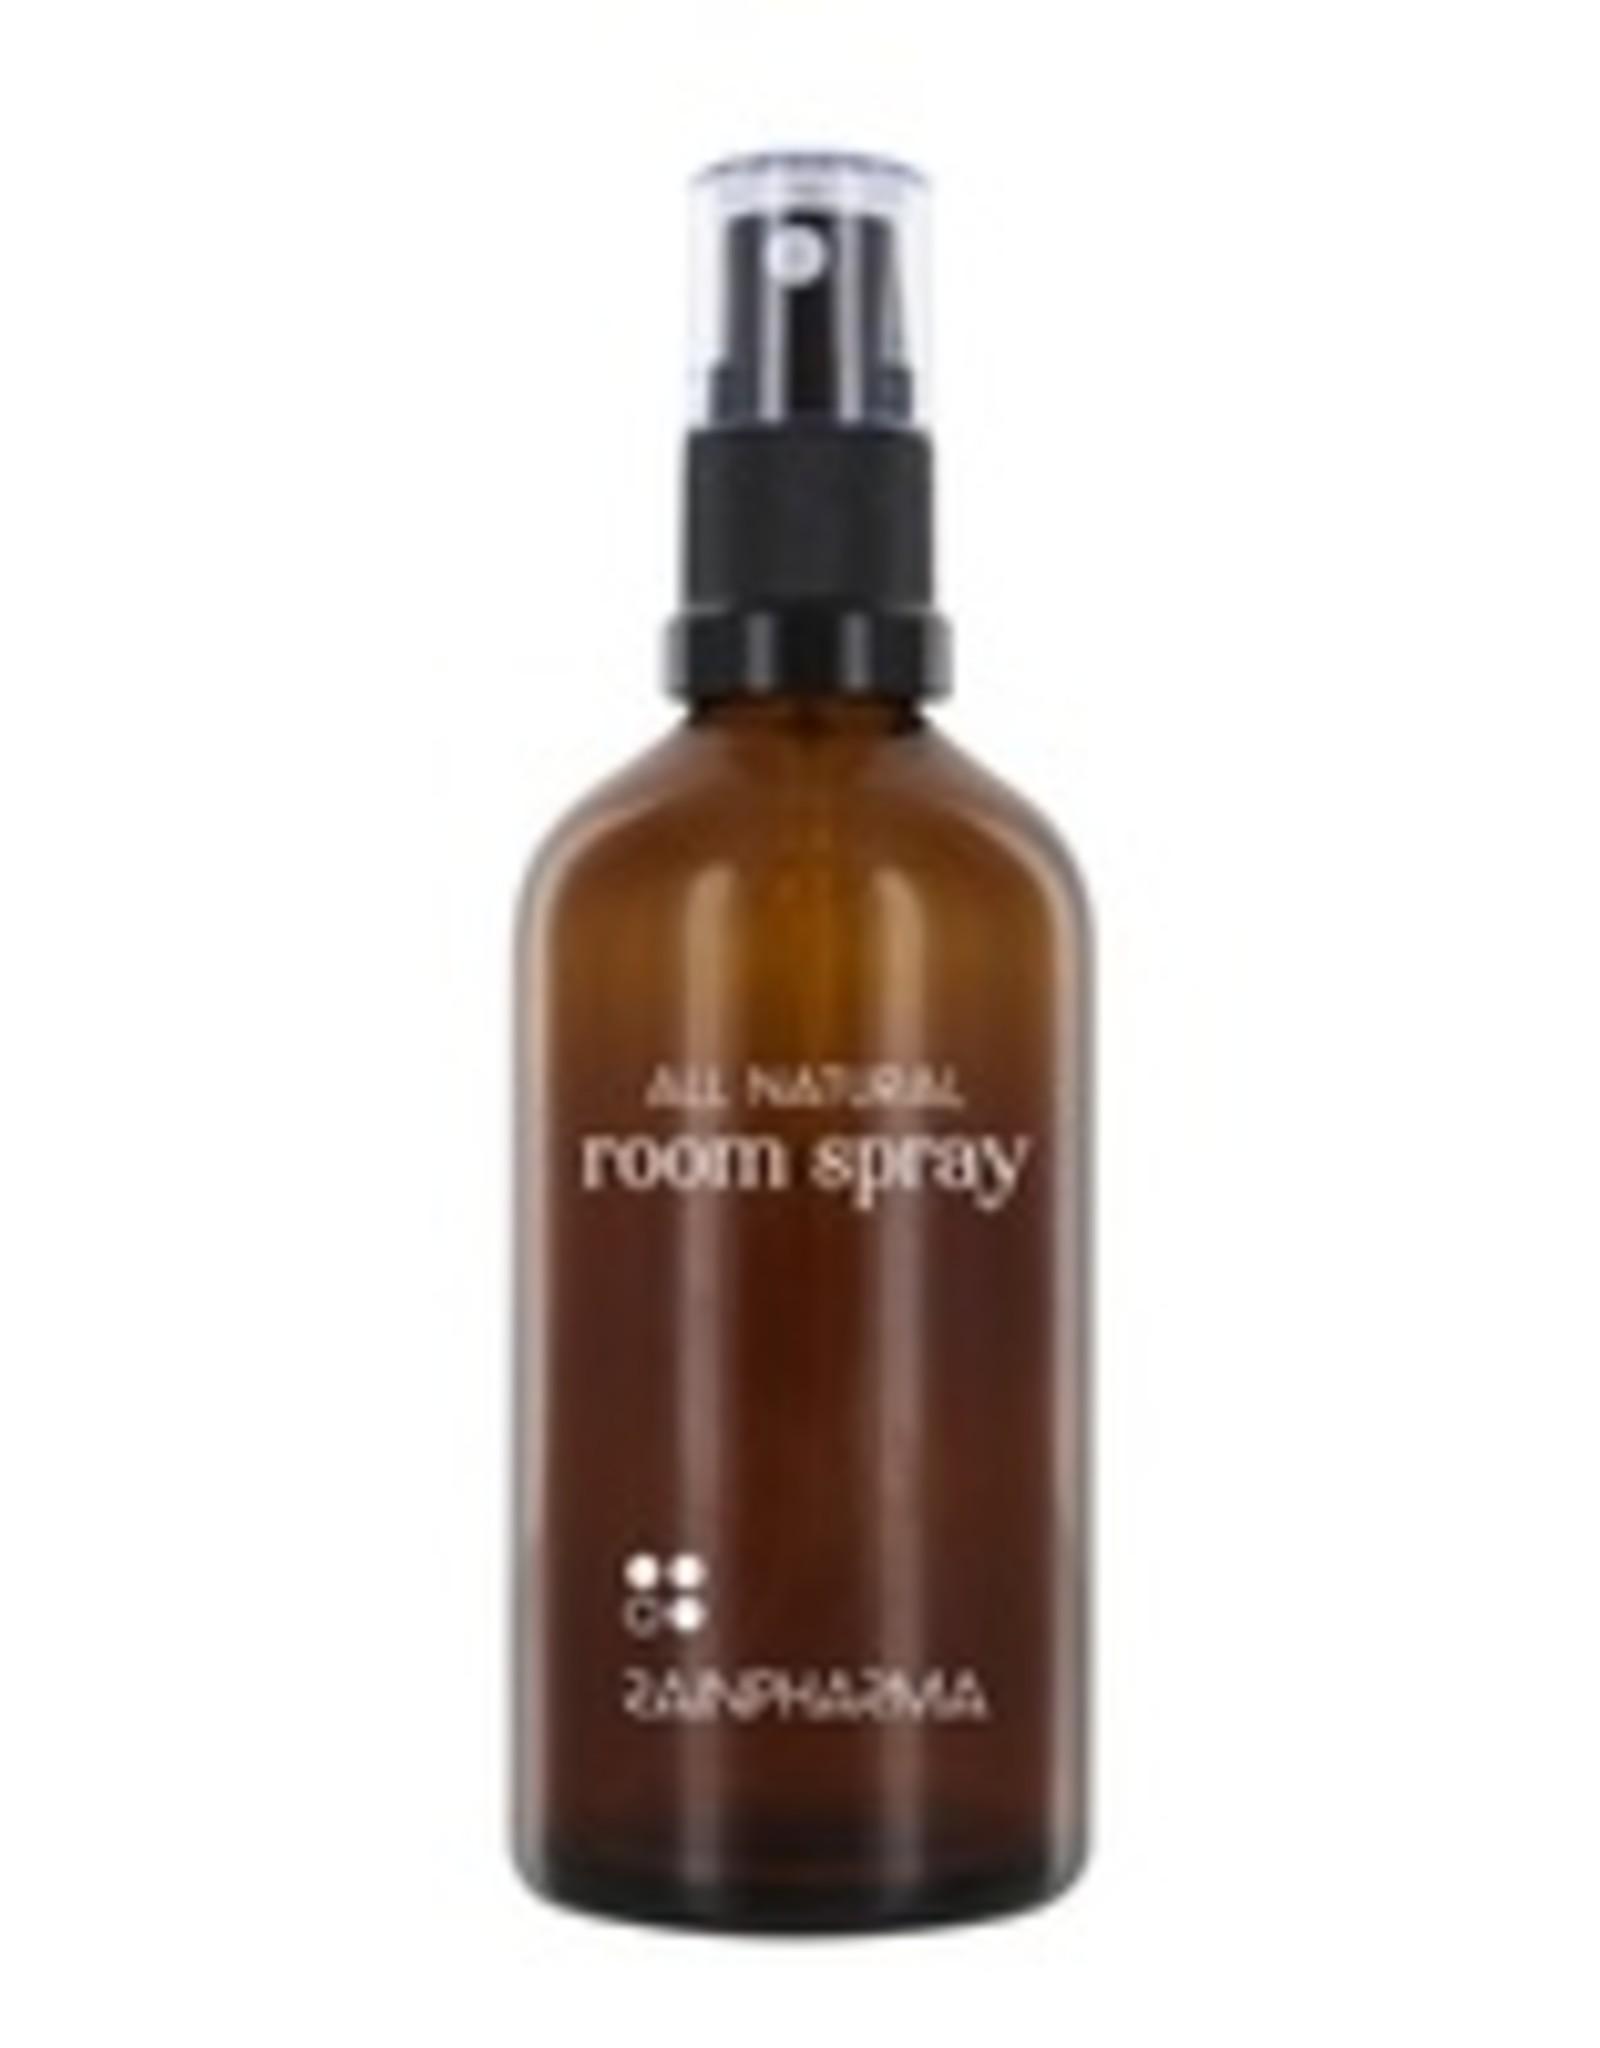 RainPharma Rainpharma - Room Spray Bottle 100ml Brown Glass